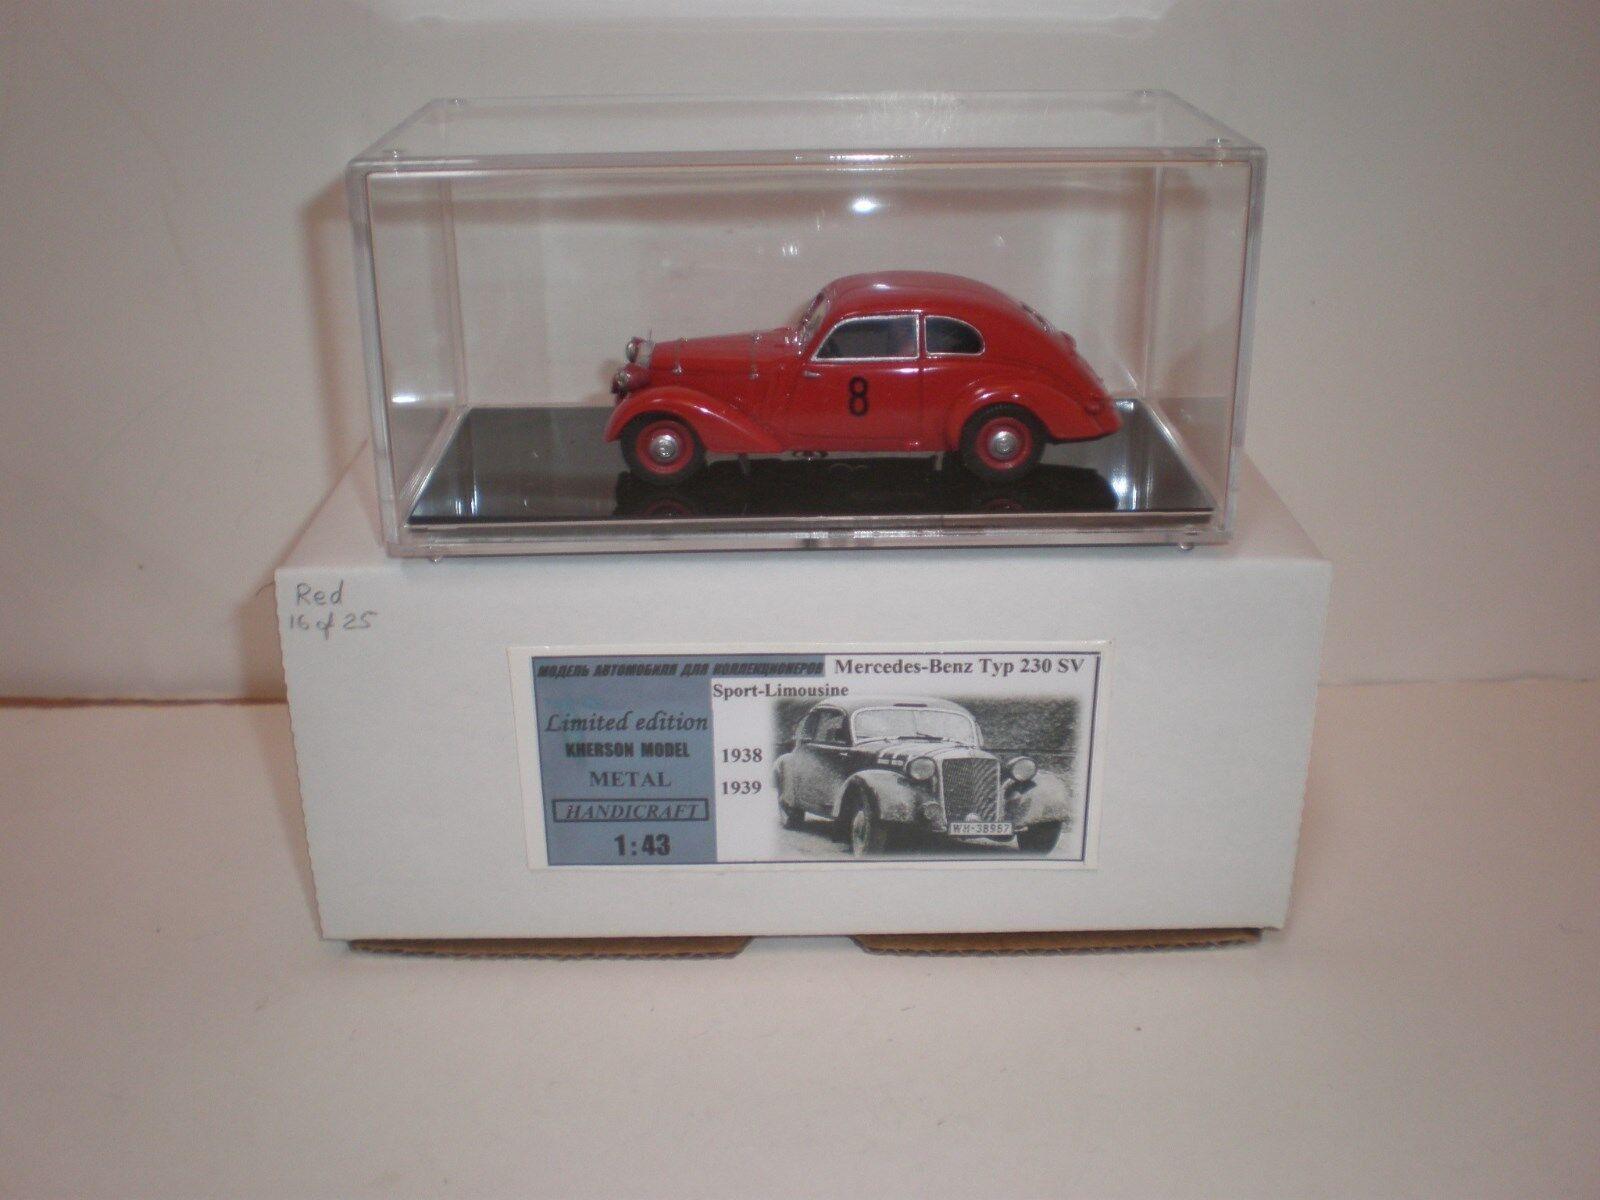 1 43 1938-1939 Mercedes Benz 230 SV Sport Limousine red